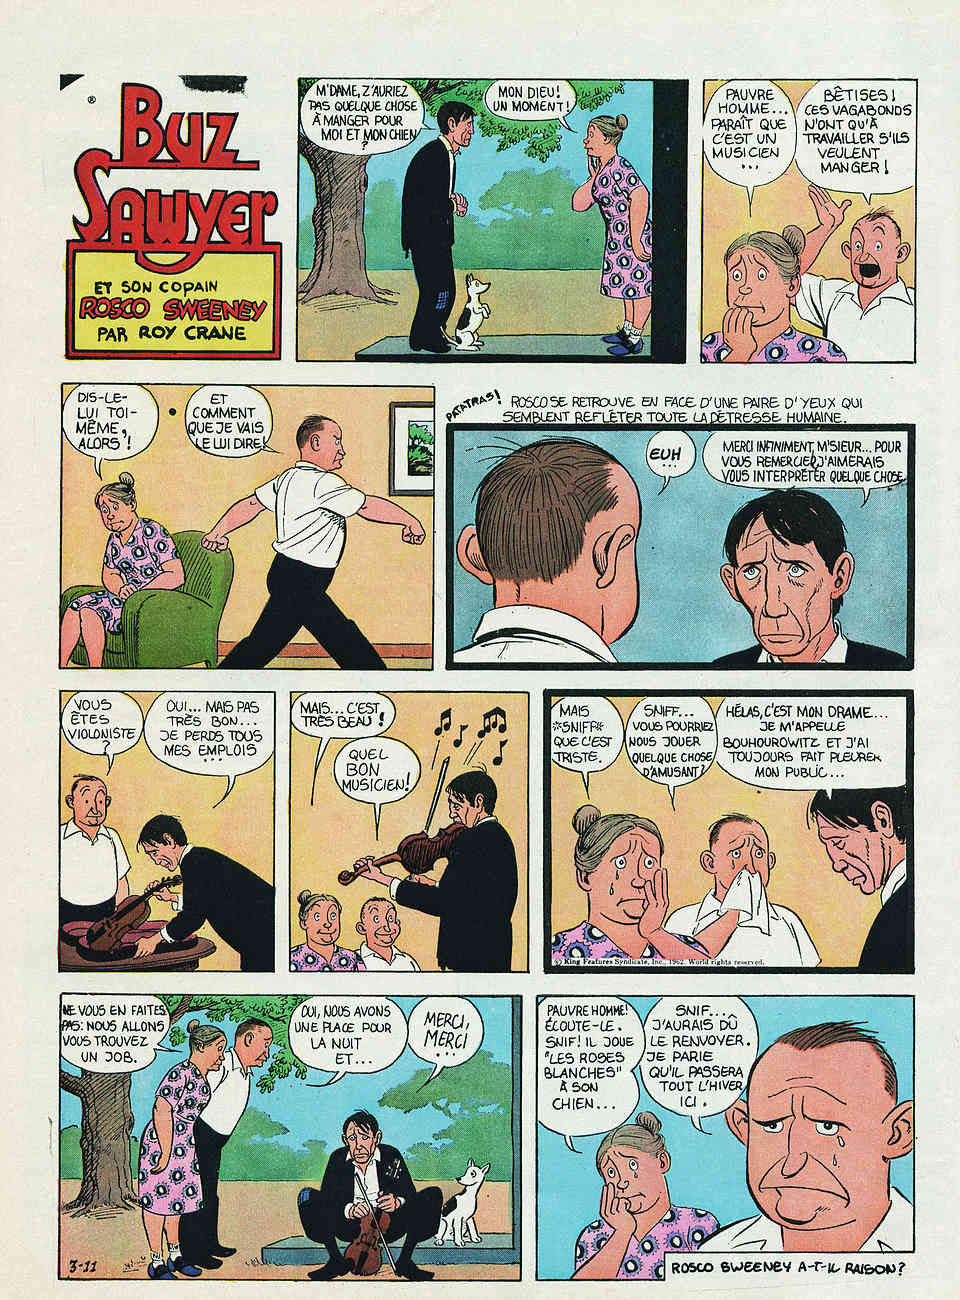 Wash Tubbs, Buz Sawyer par Roy Crane - Page 3 Cranes12